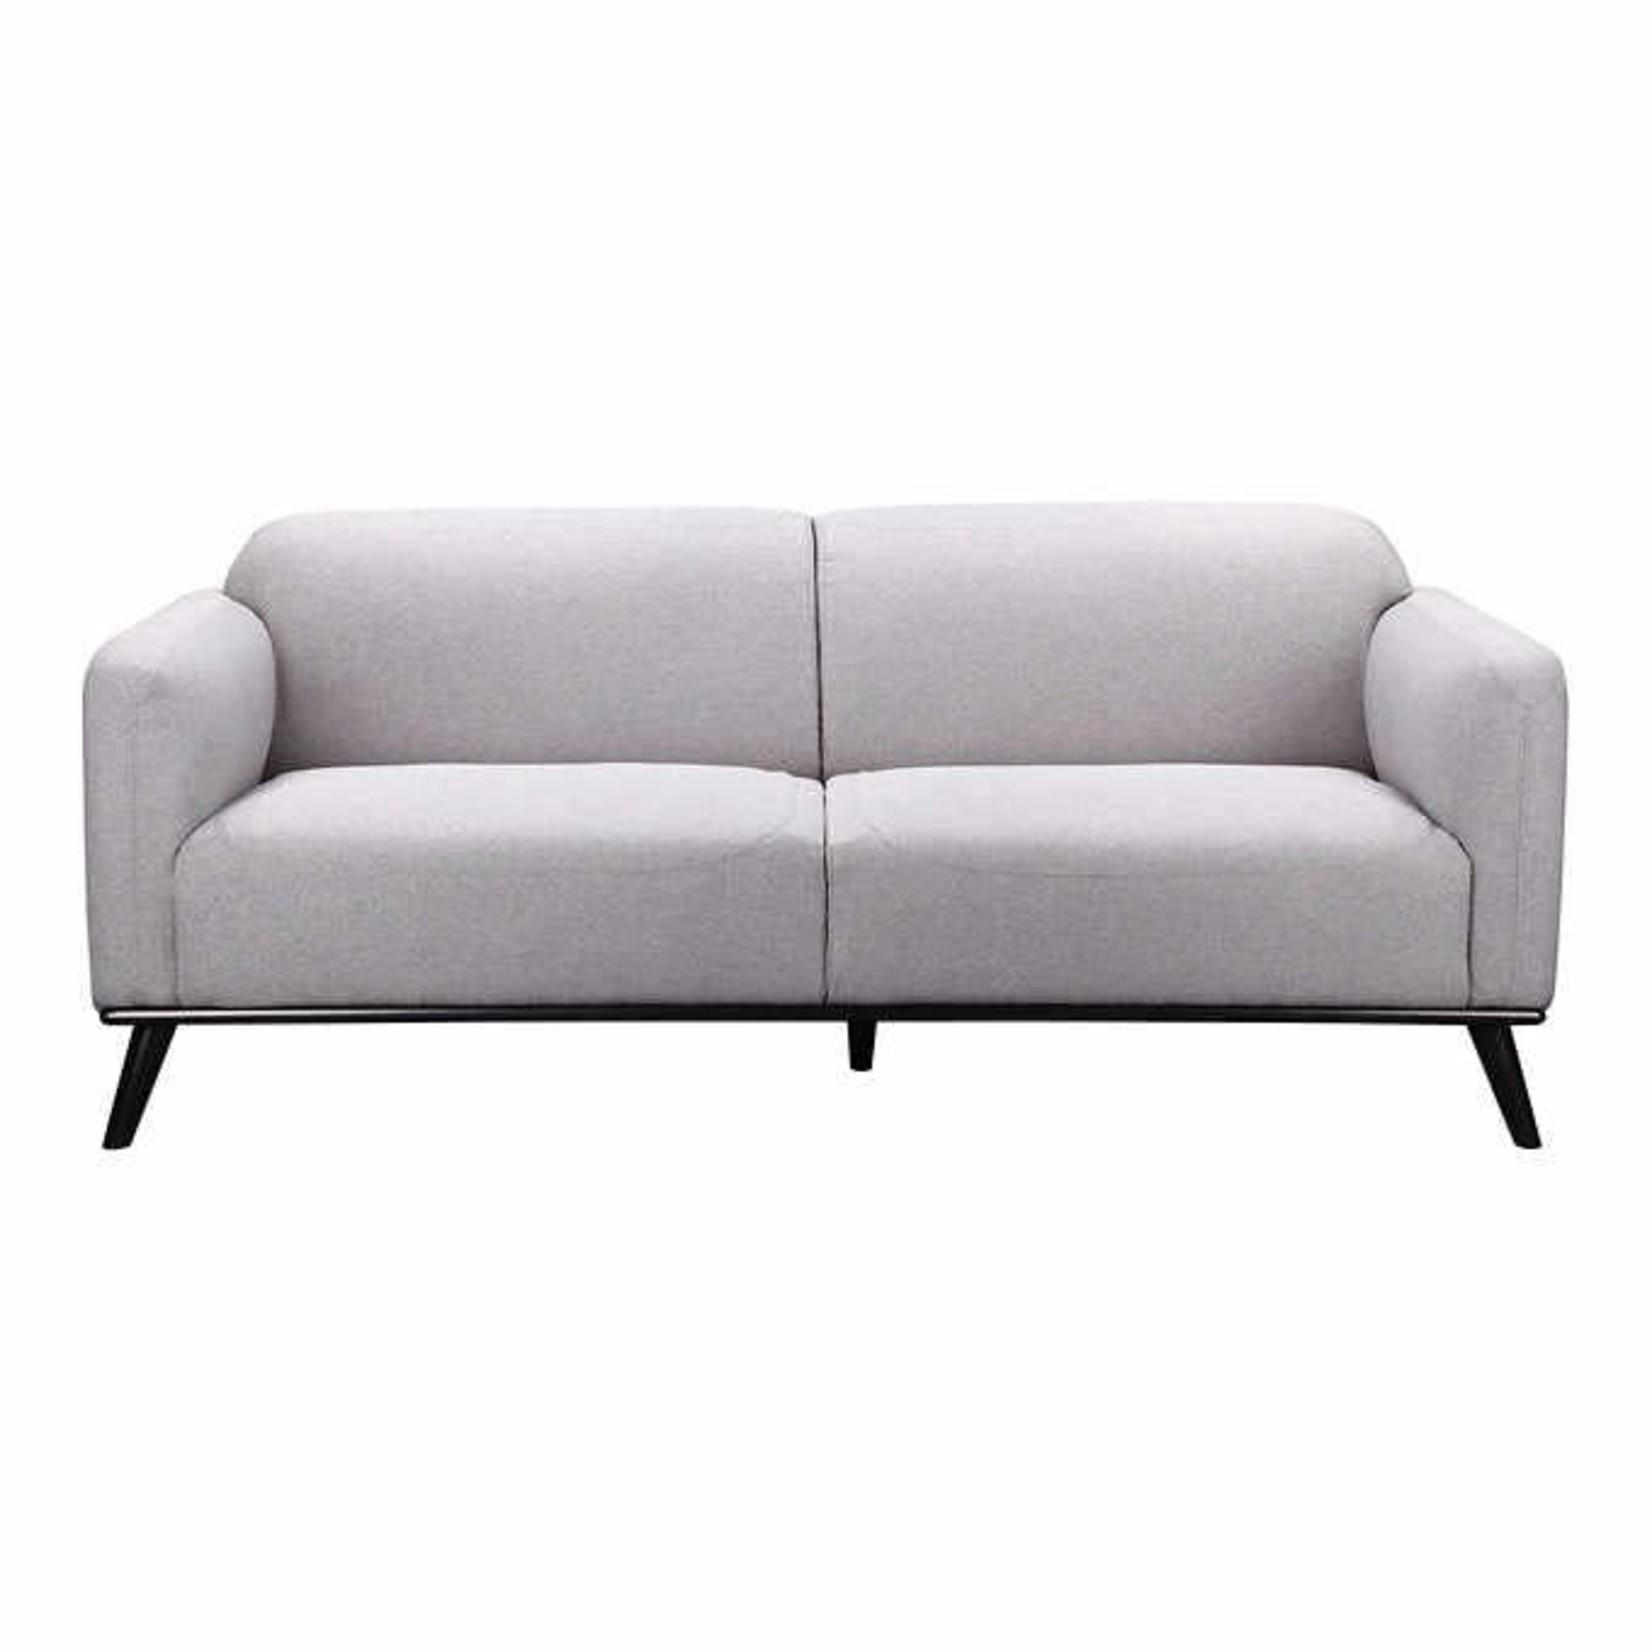 Luxe Modern Fabric Sofa Grey *Scuffs on legs